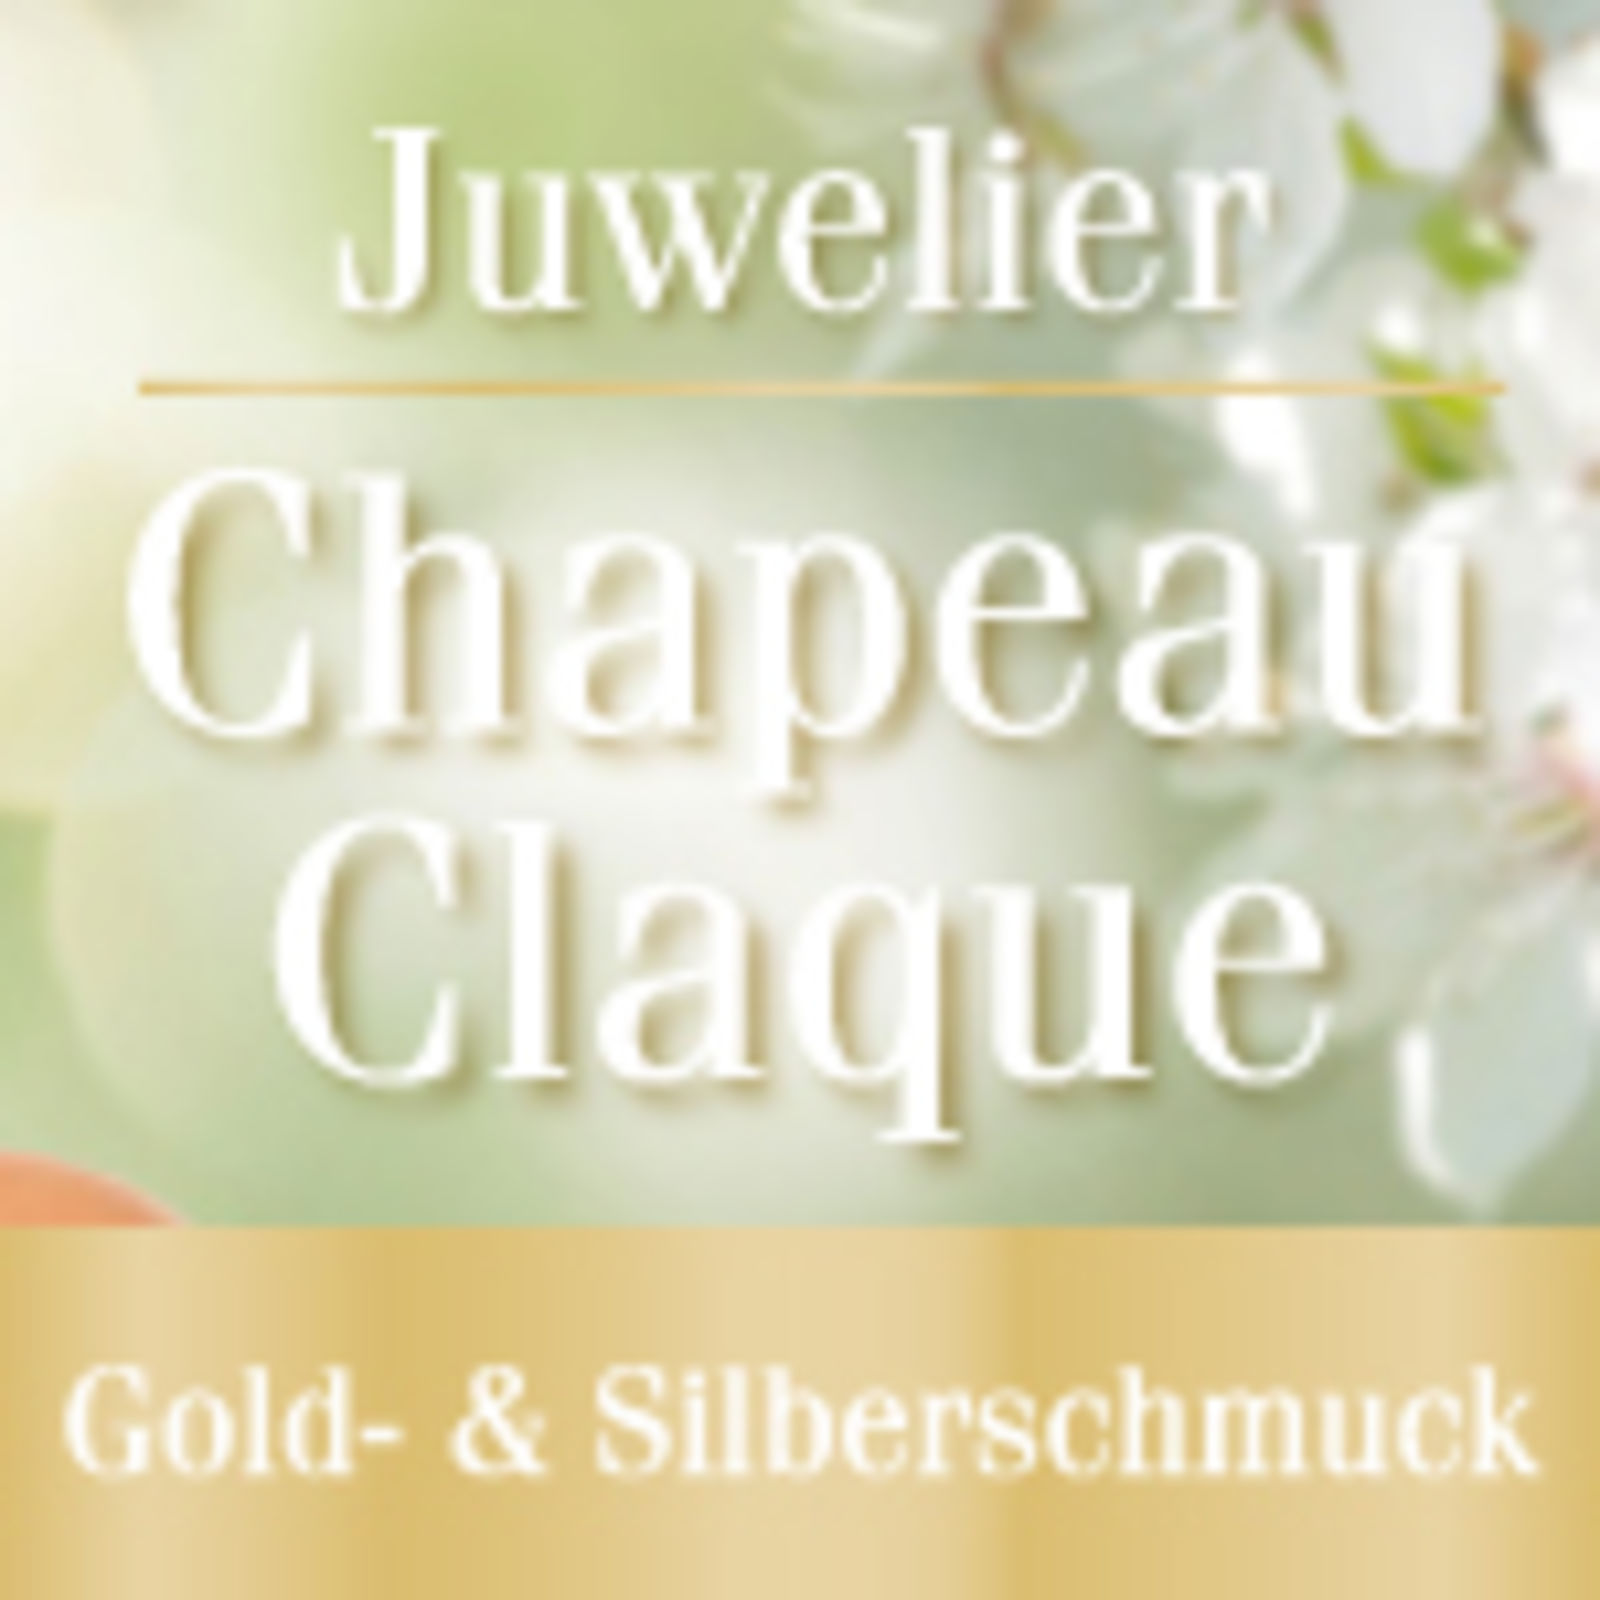 Juwelier Chapeau Claque in Lüdenscheid (Bild 7)